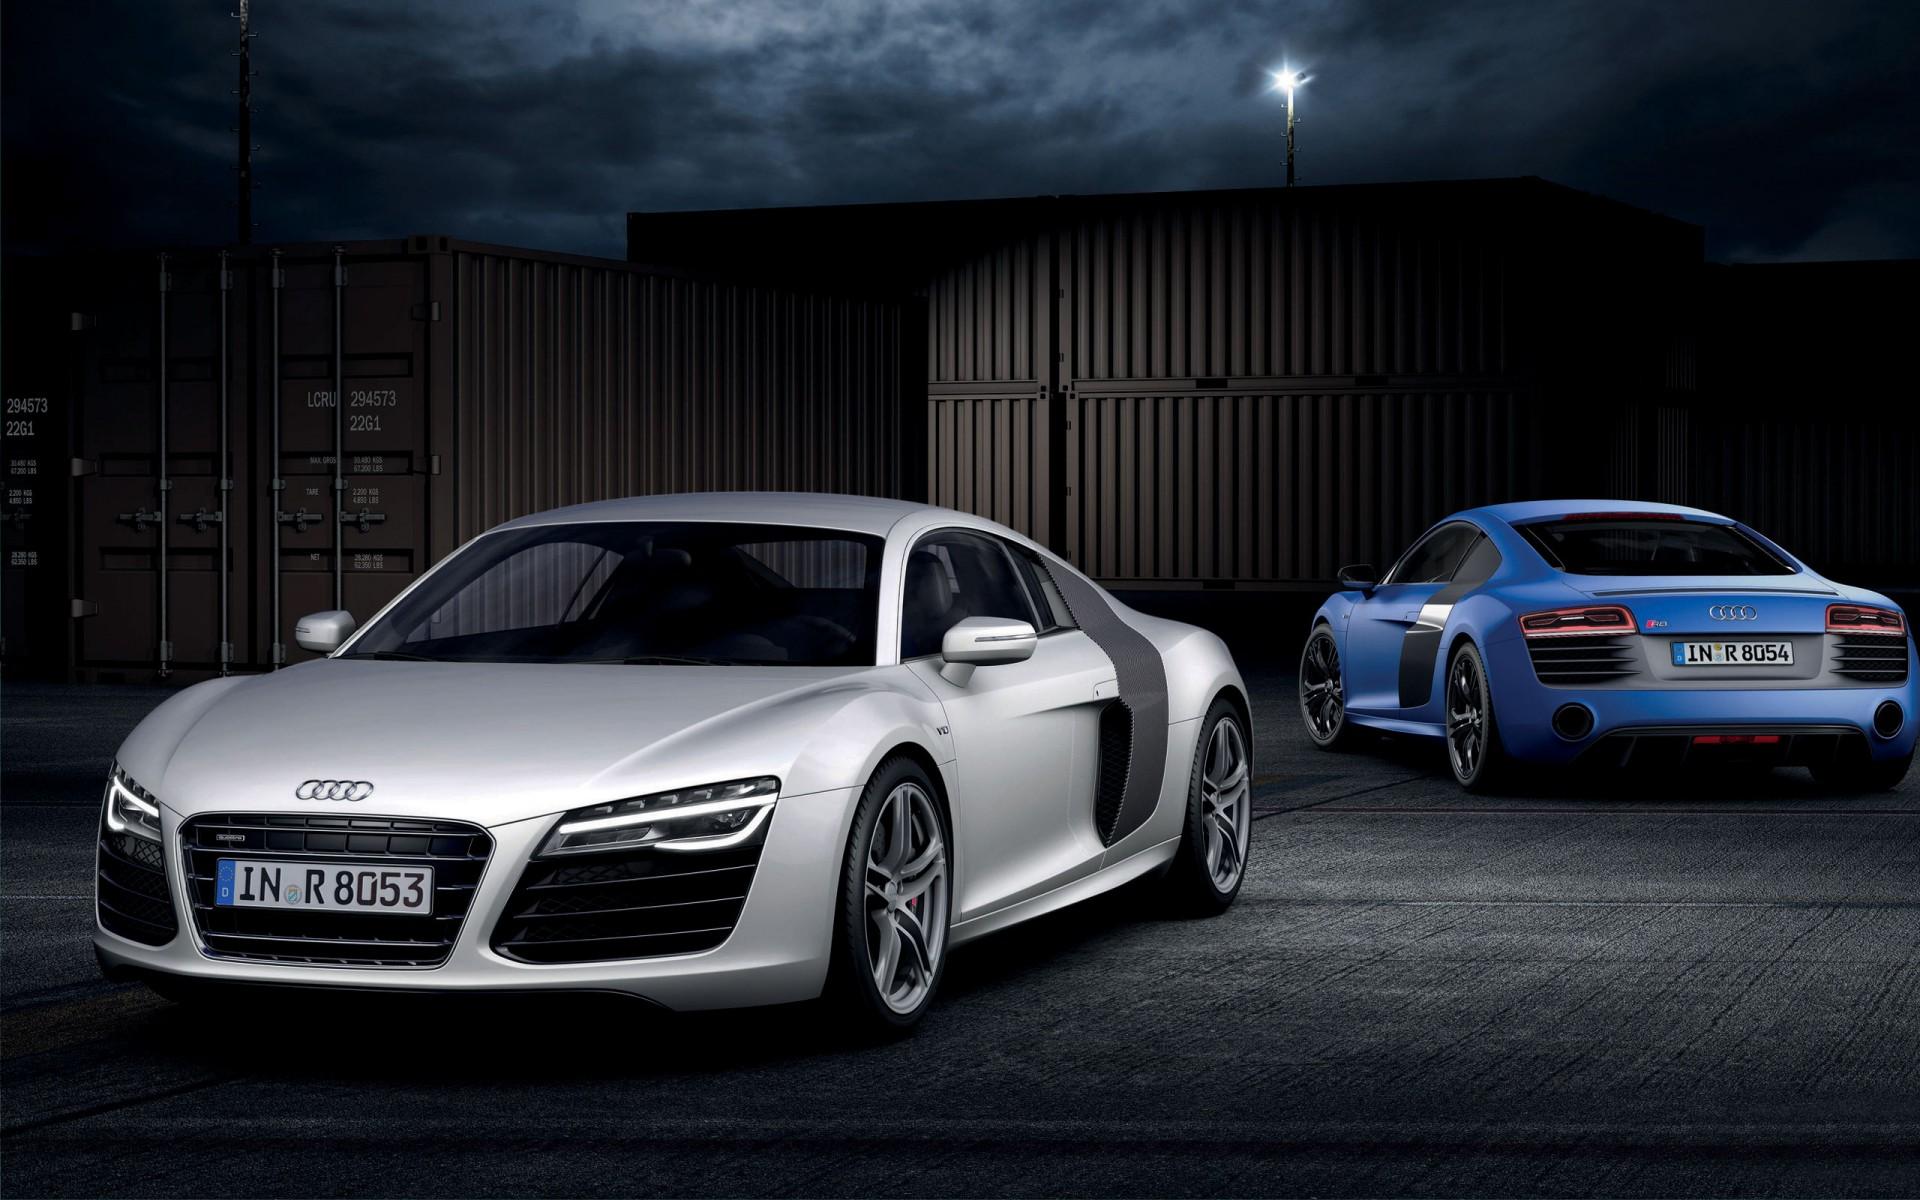 2013 Audi R8 V10 Plus 3 Wallpaper Hd Car Wallpapers Id